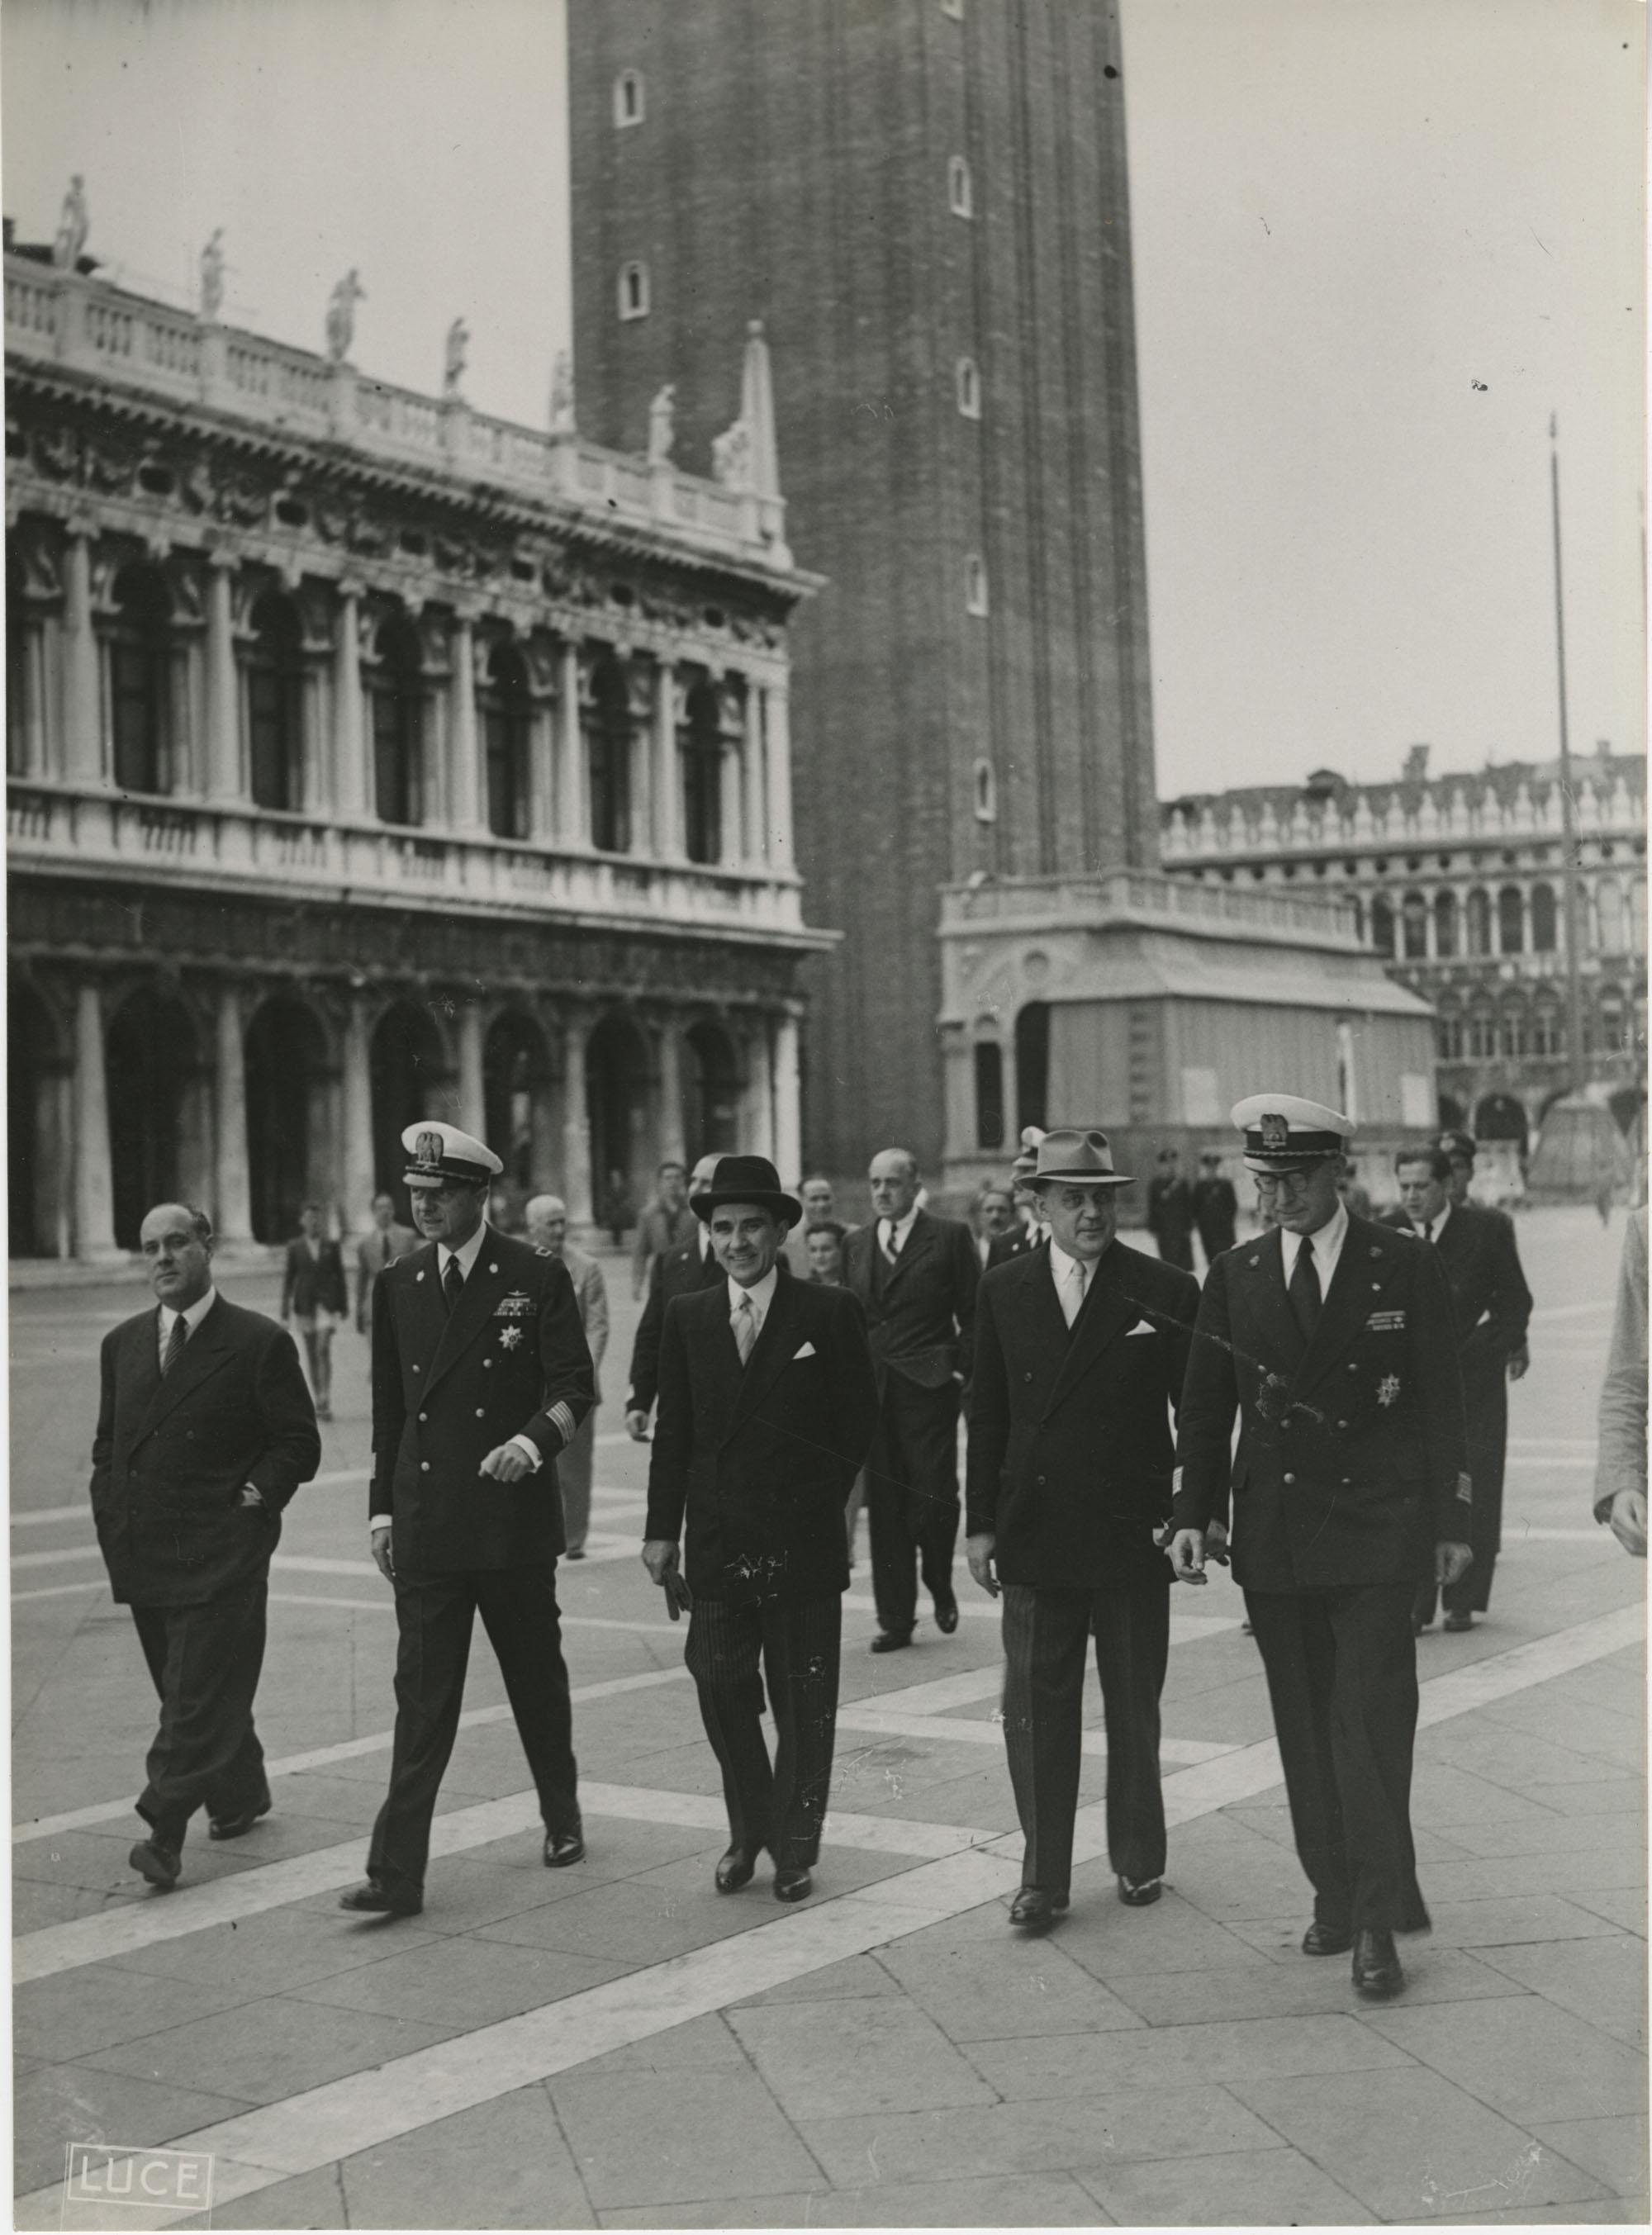 Mihai Antonescu's visit to Benito Mussolini, Photograph 7